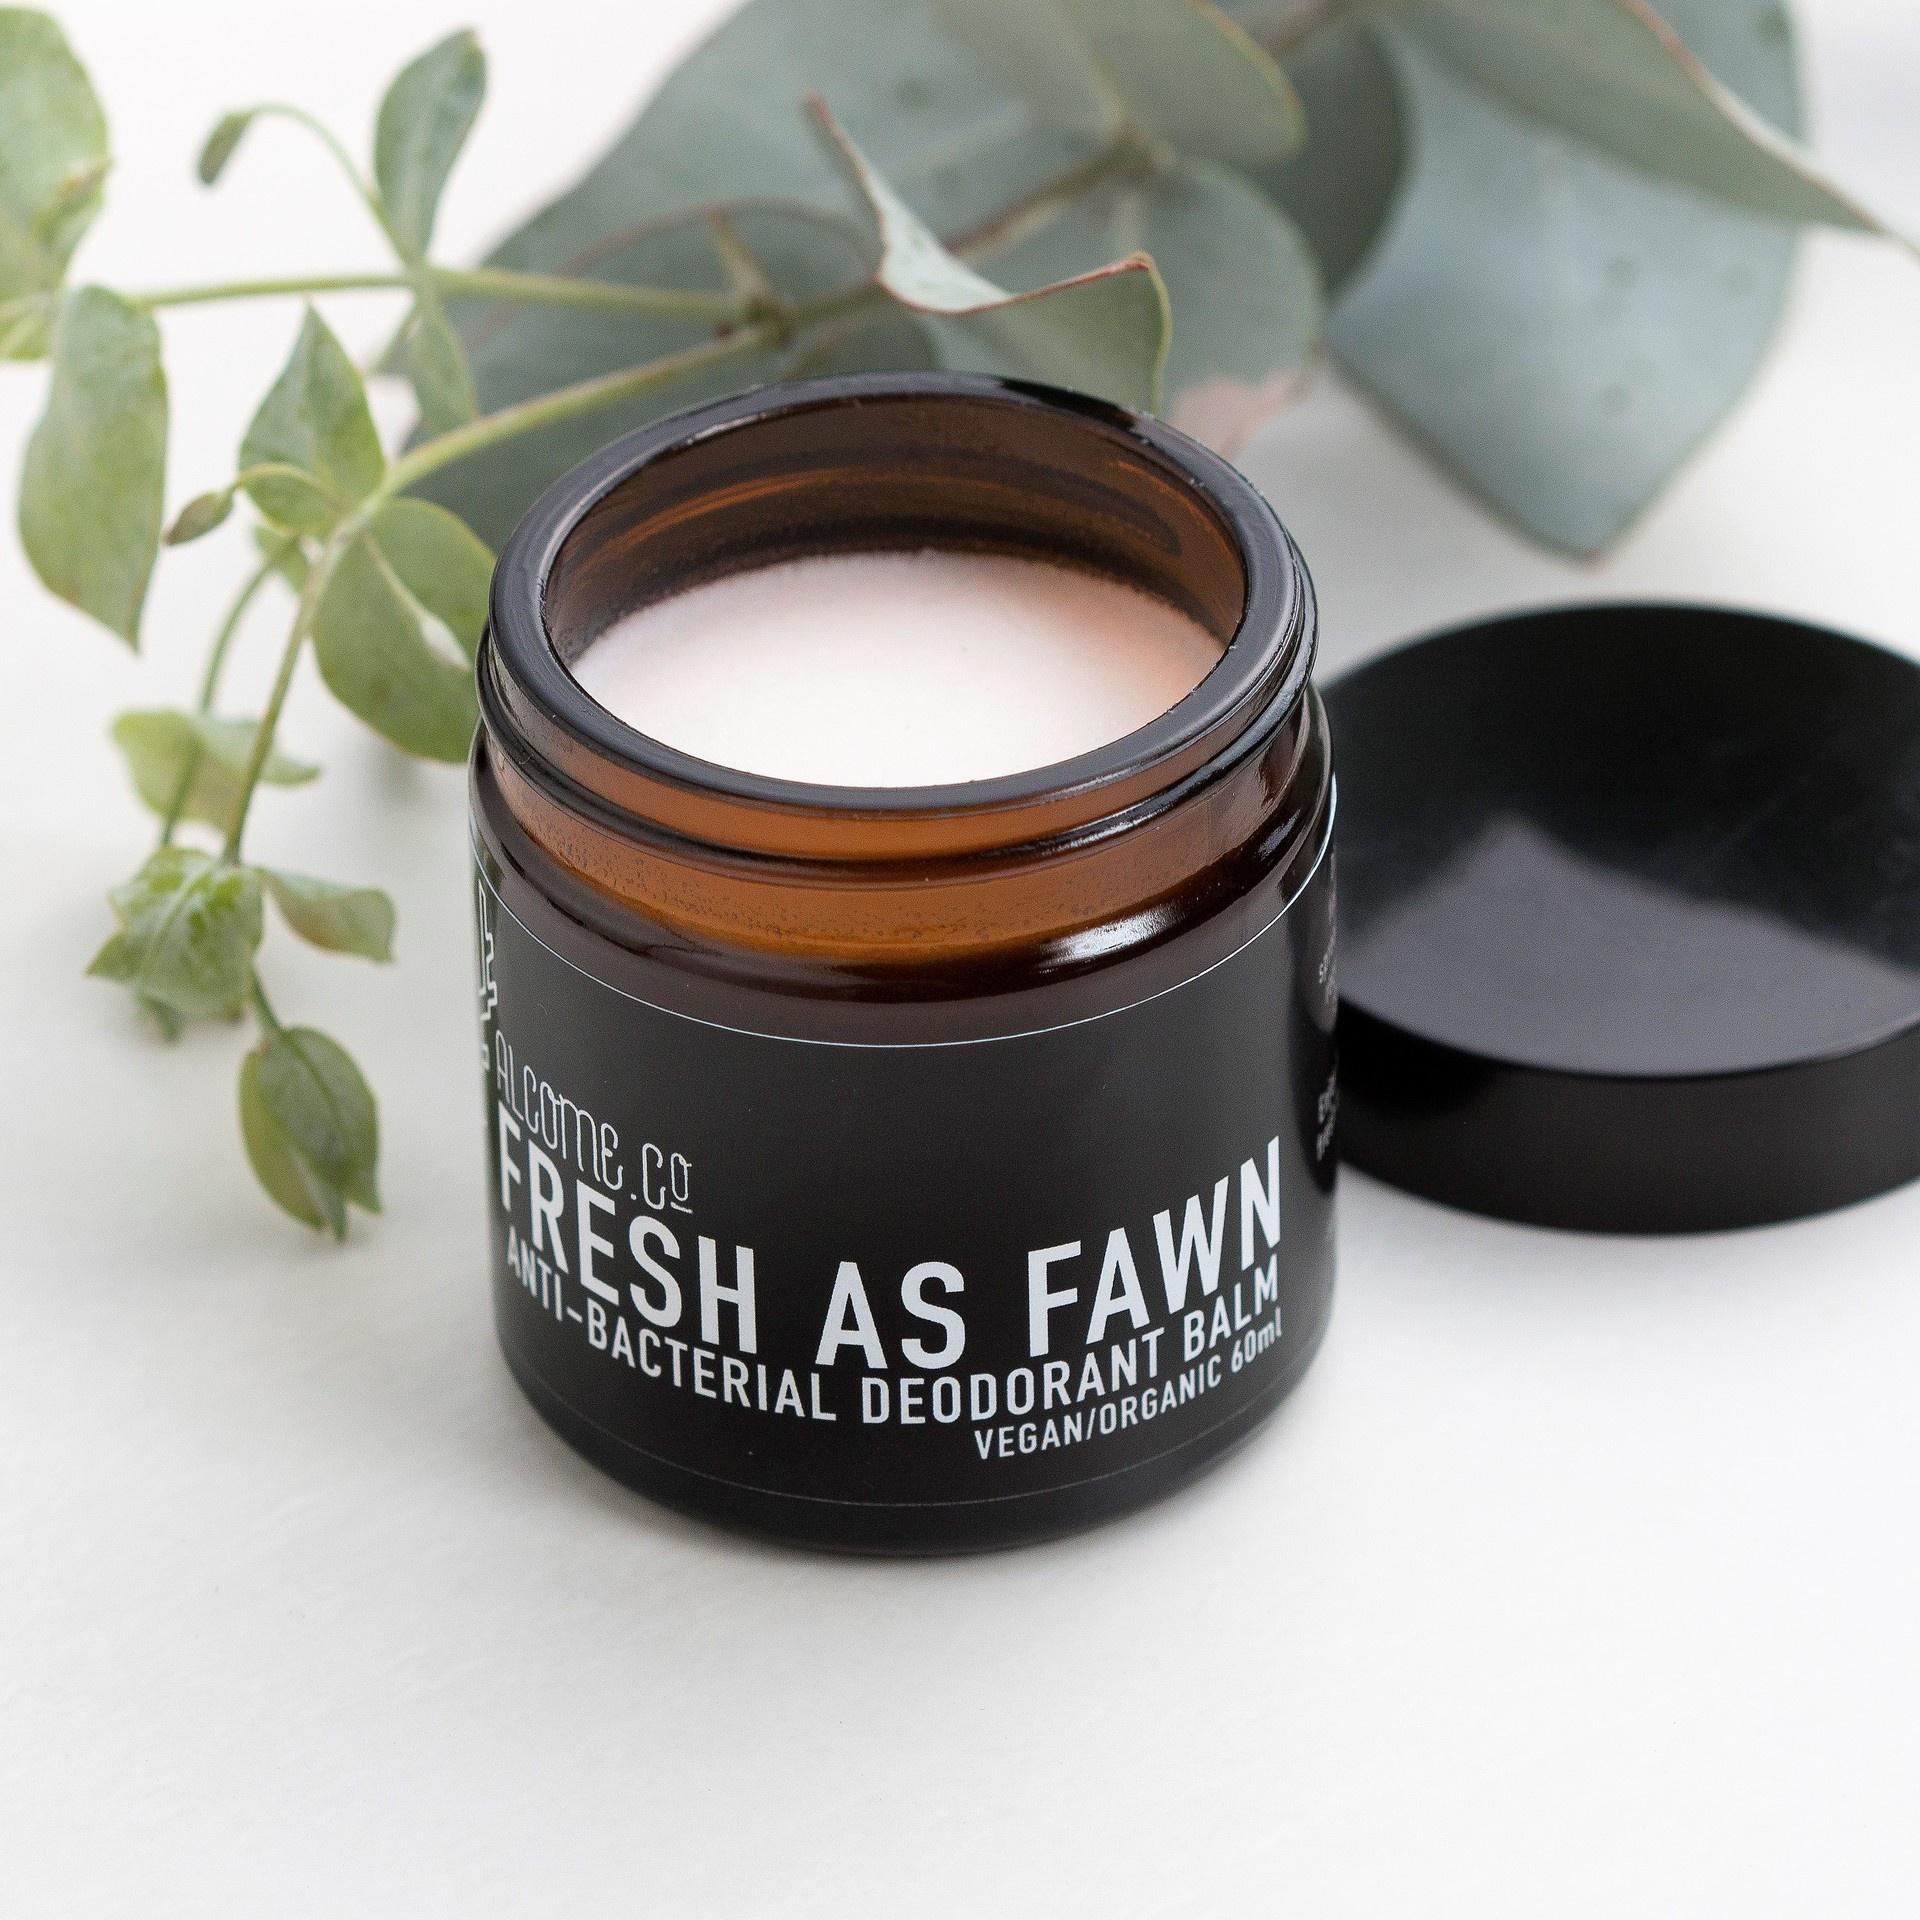 Organic Deodorant Balm / Fresh as Fawn / Normal Skin Types / Vegan Organic Natural